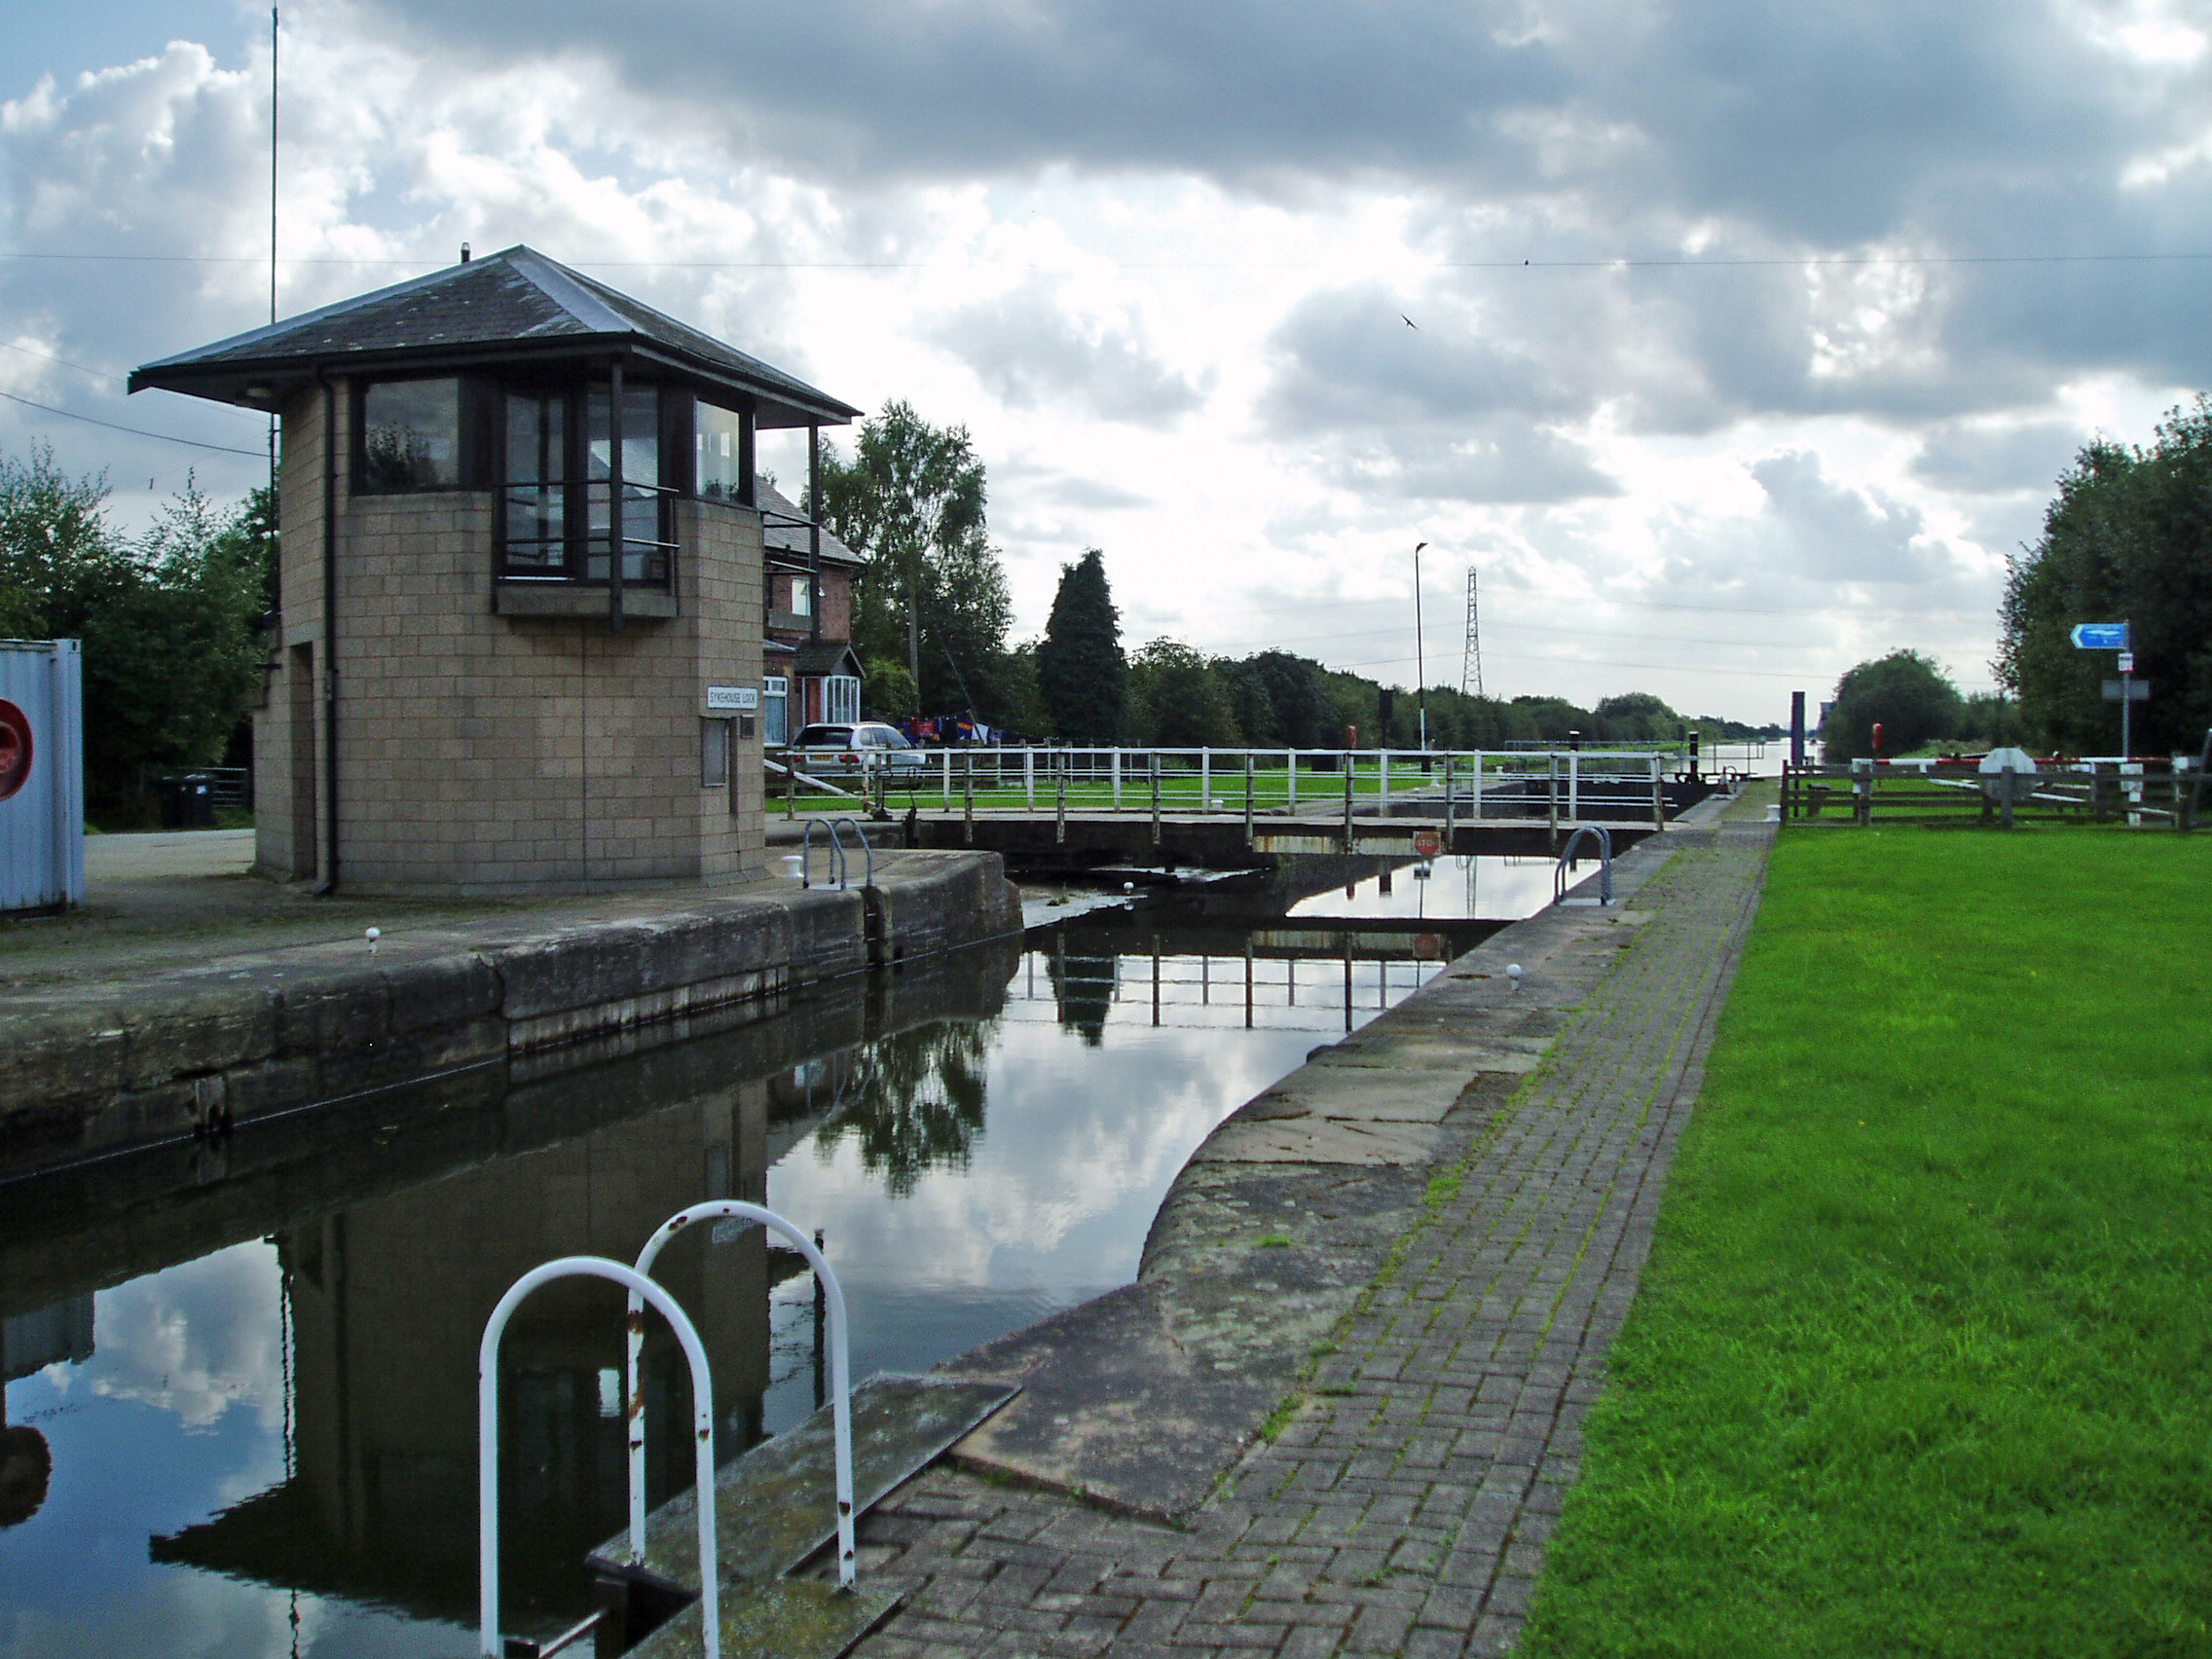 Sykehouse Lock